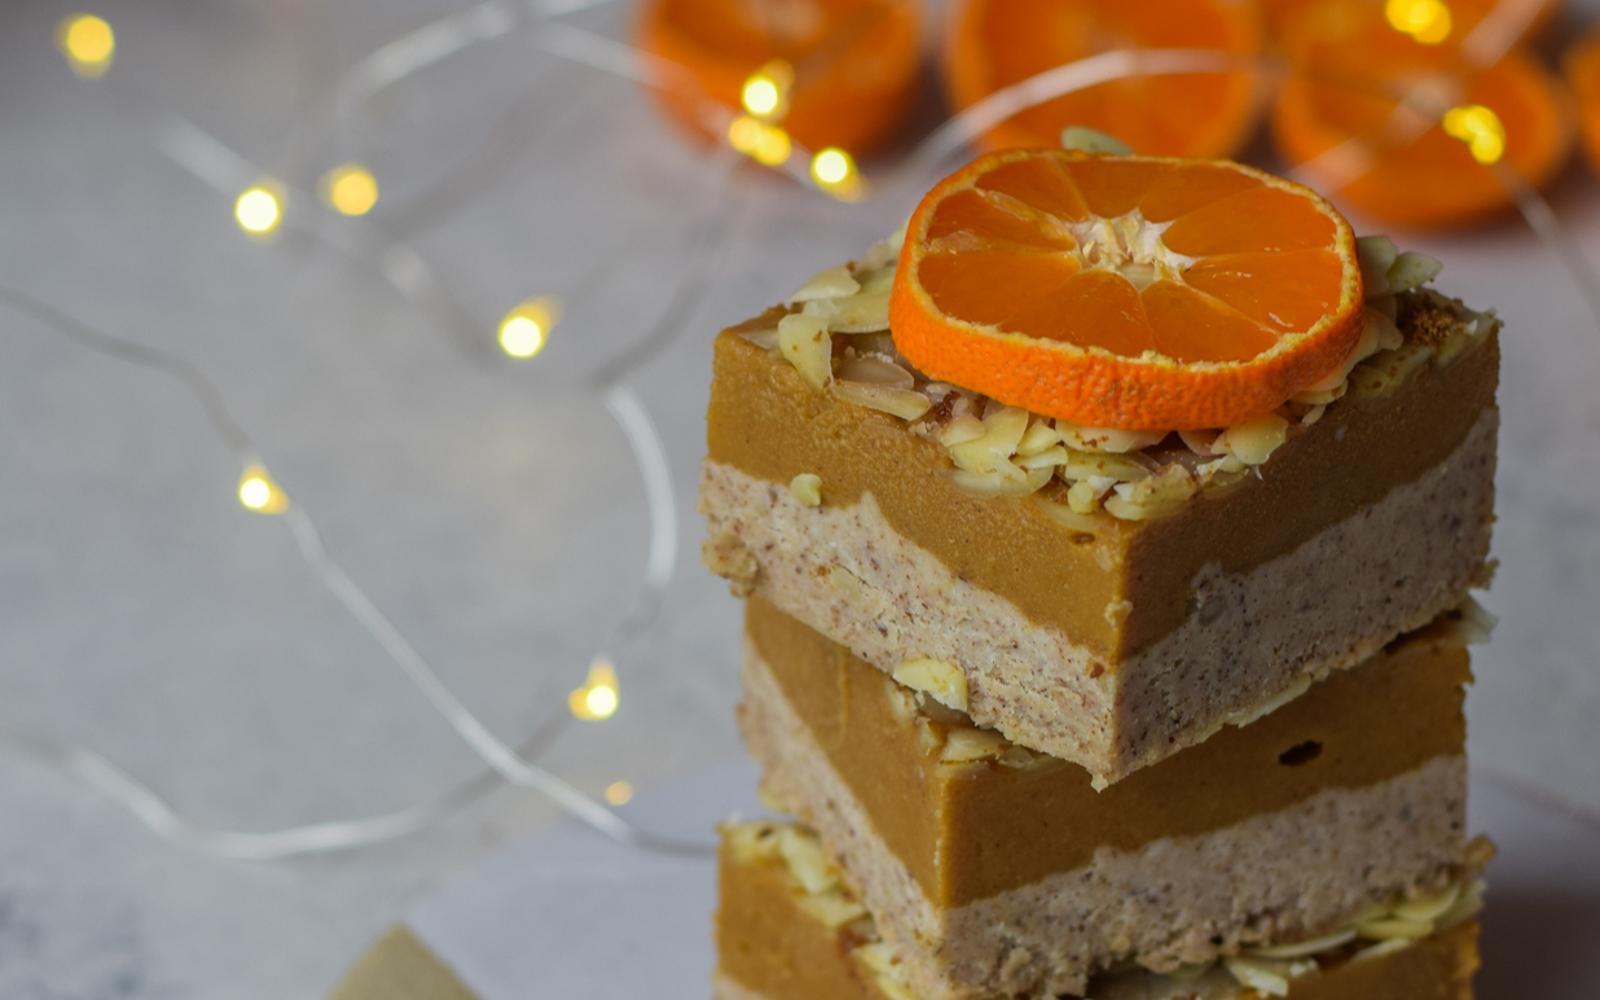 Vanilla Orange Pumpkin Bars topped with almonds and orange